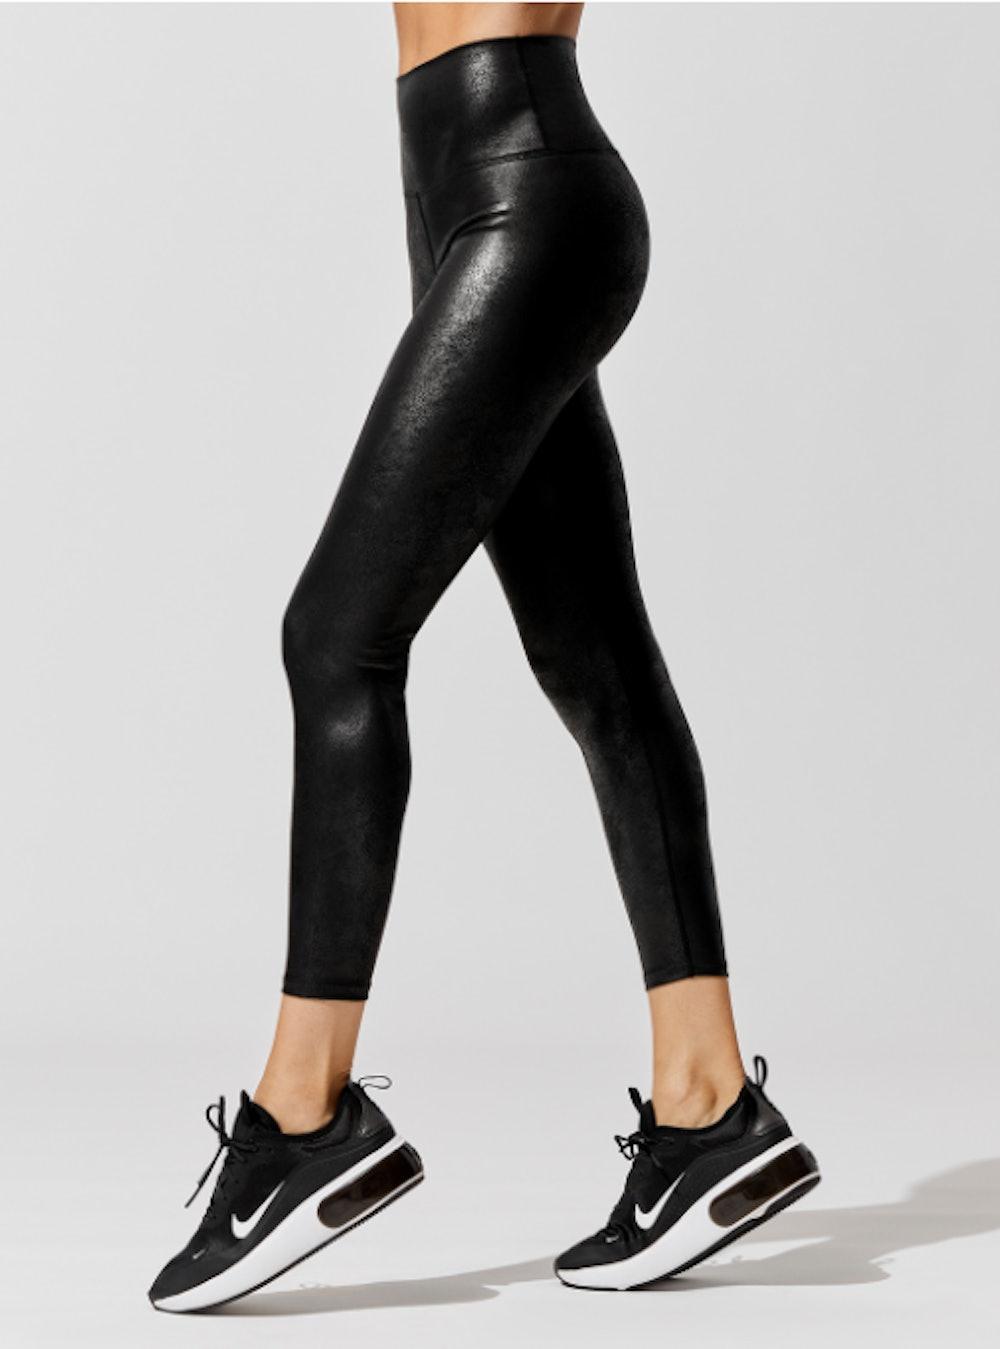 Carbon38 Leatherette High Rise 7/8 Legging